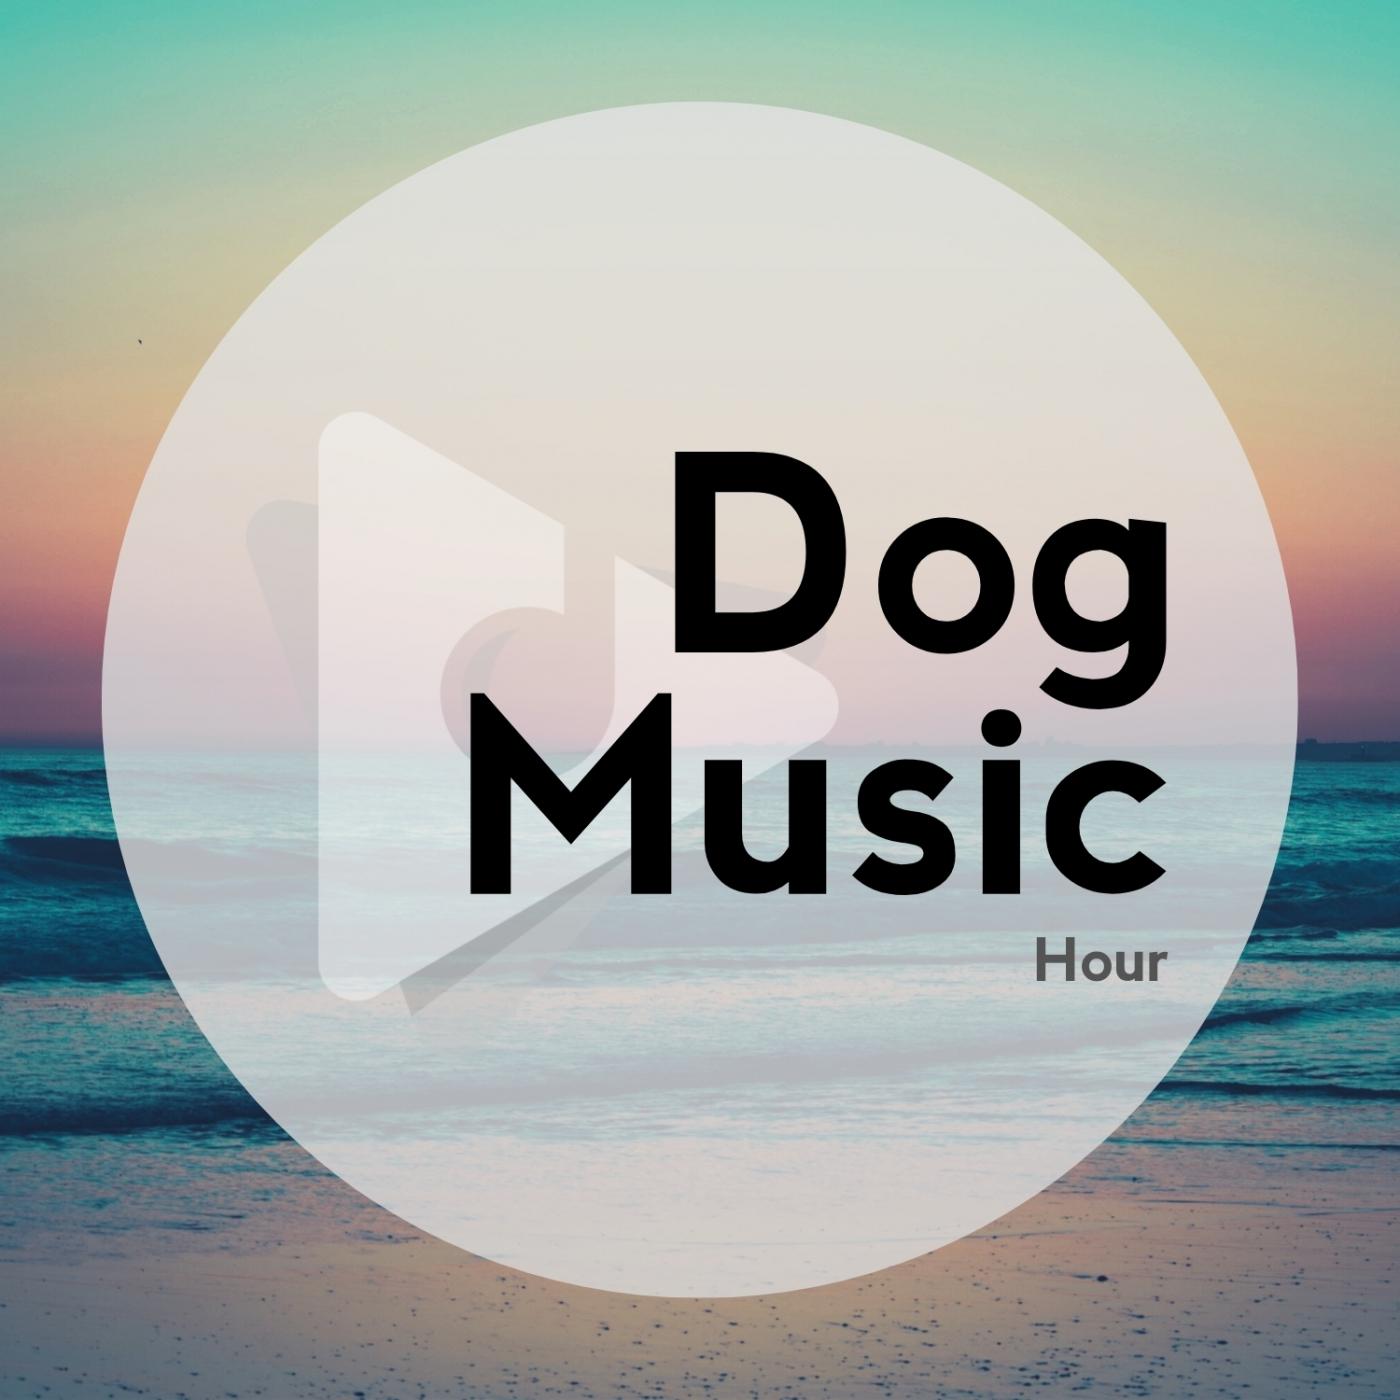 Dog Music Hour